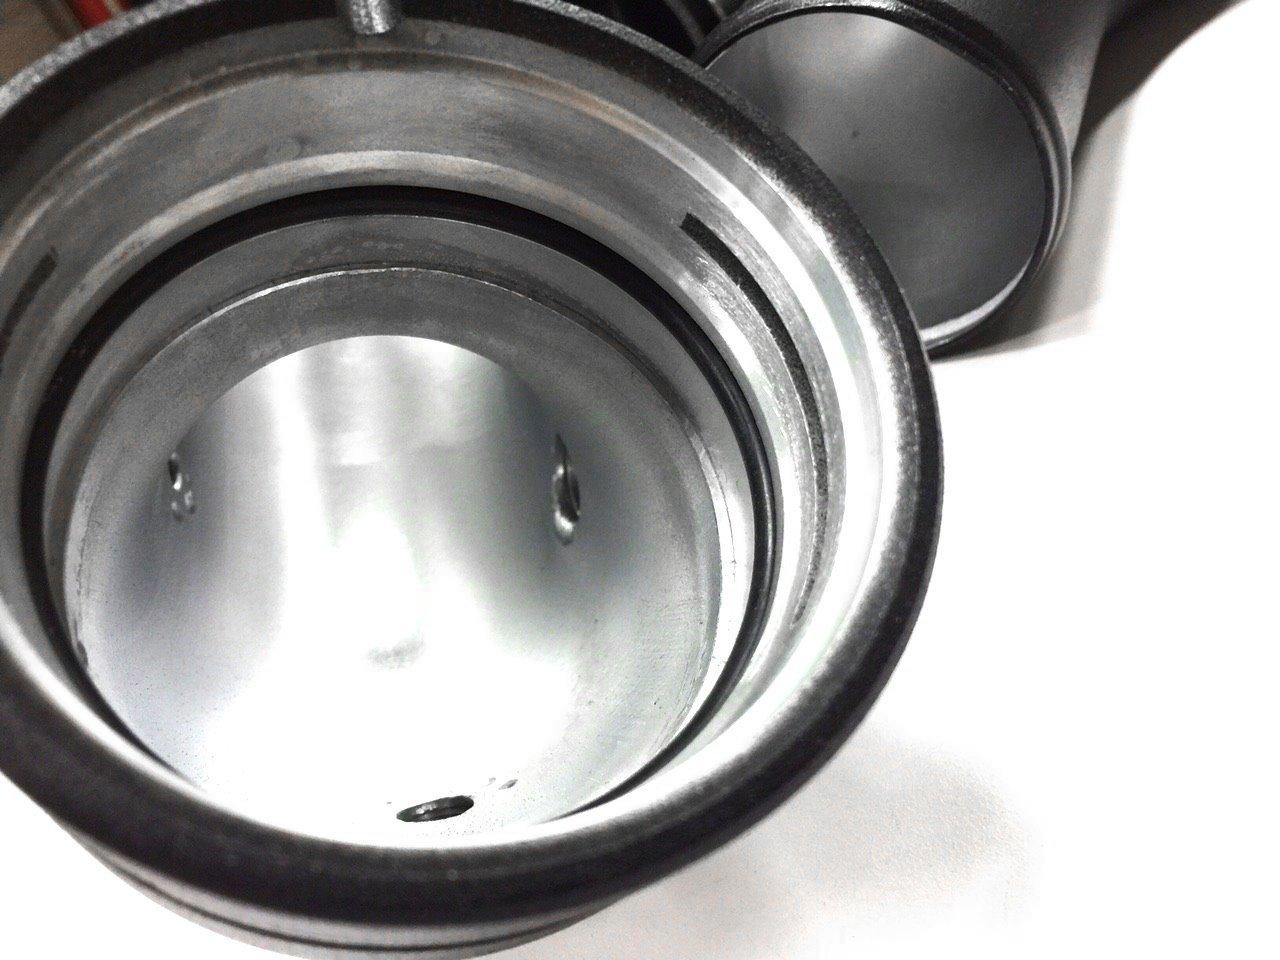 FTP Tubo de carga Boost Kit de tubo para BMW N20 2.0T F20 F30 125i 220I 320i 328i 428i aluminio sg71335 F: Amazon.es: Coche y moto